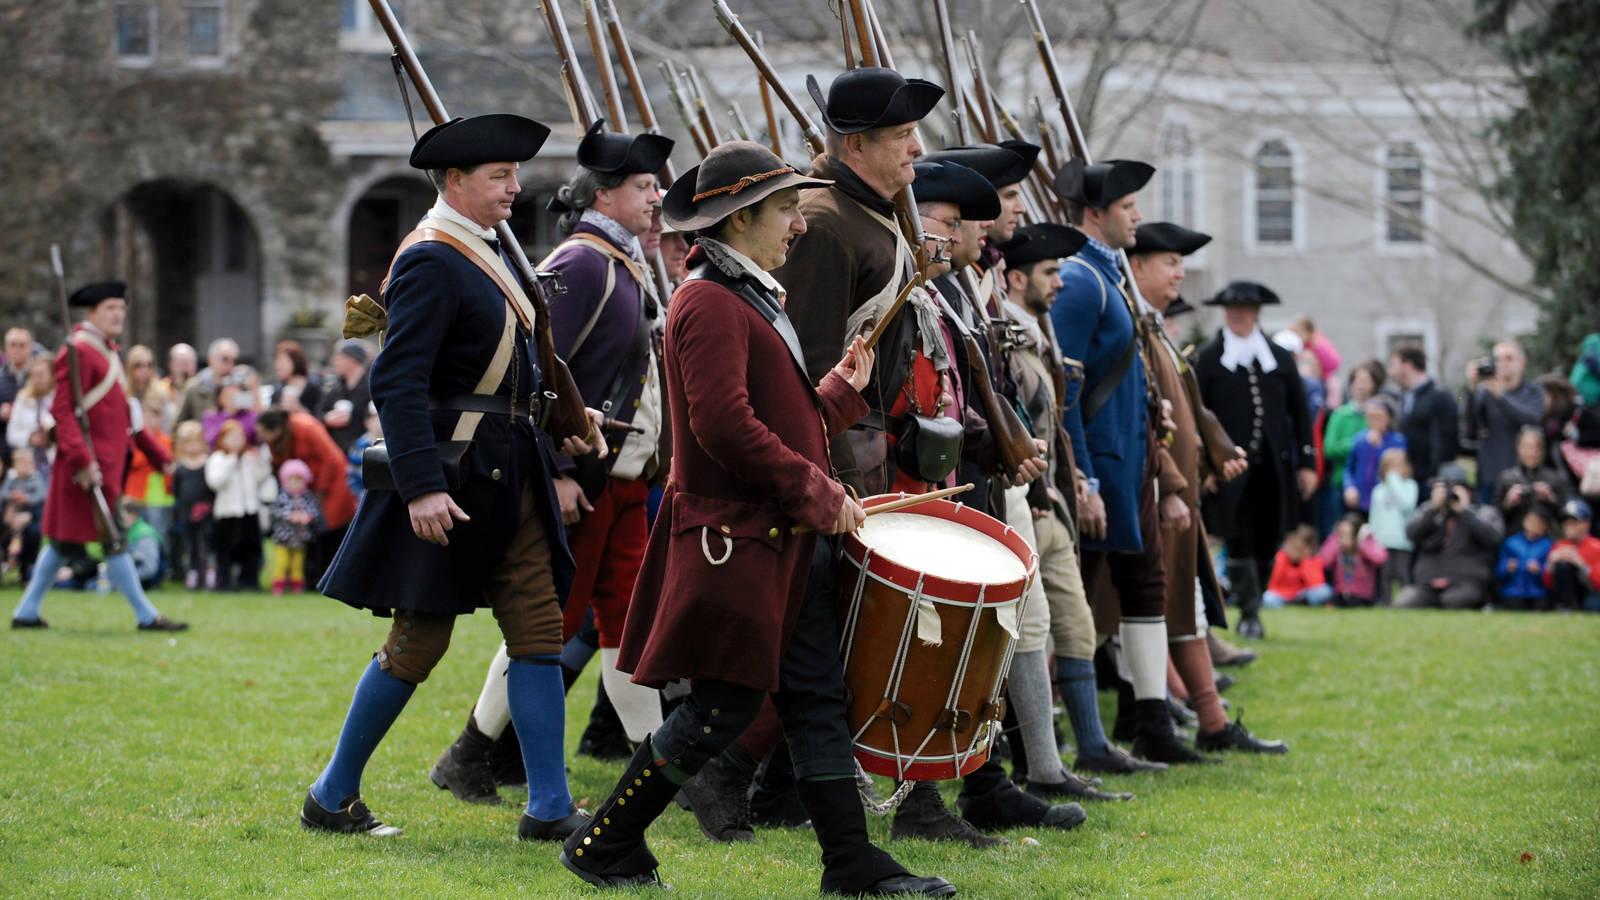 Image result for revolutionary war reenactment firing squad